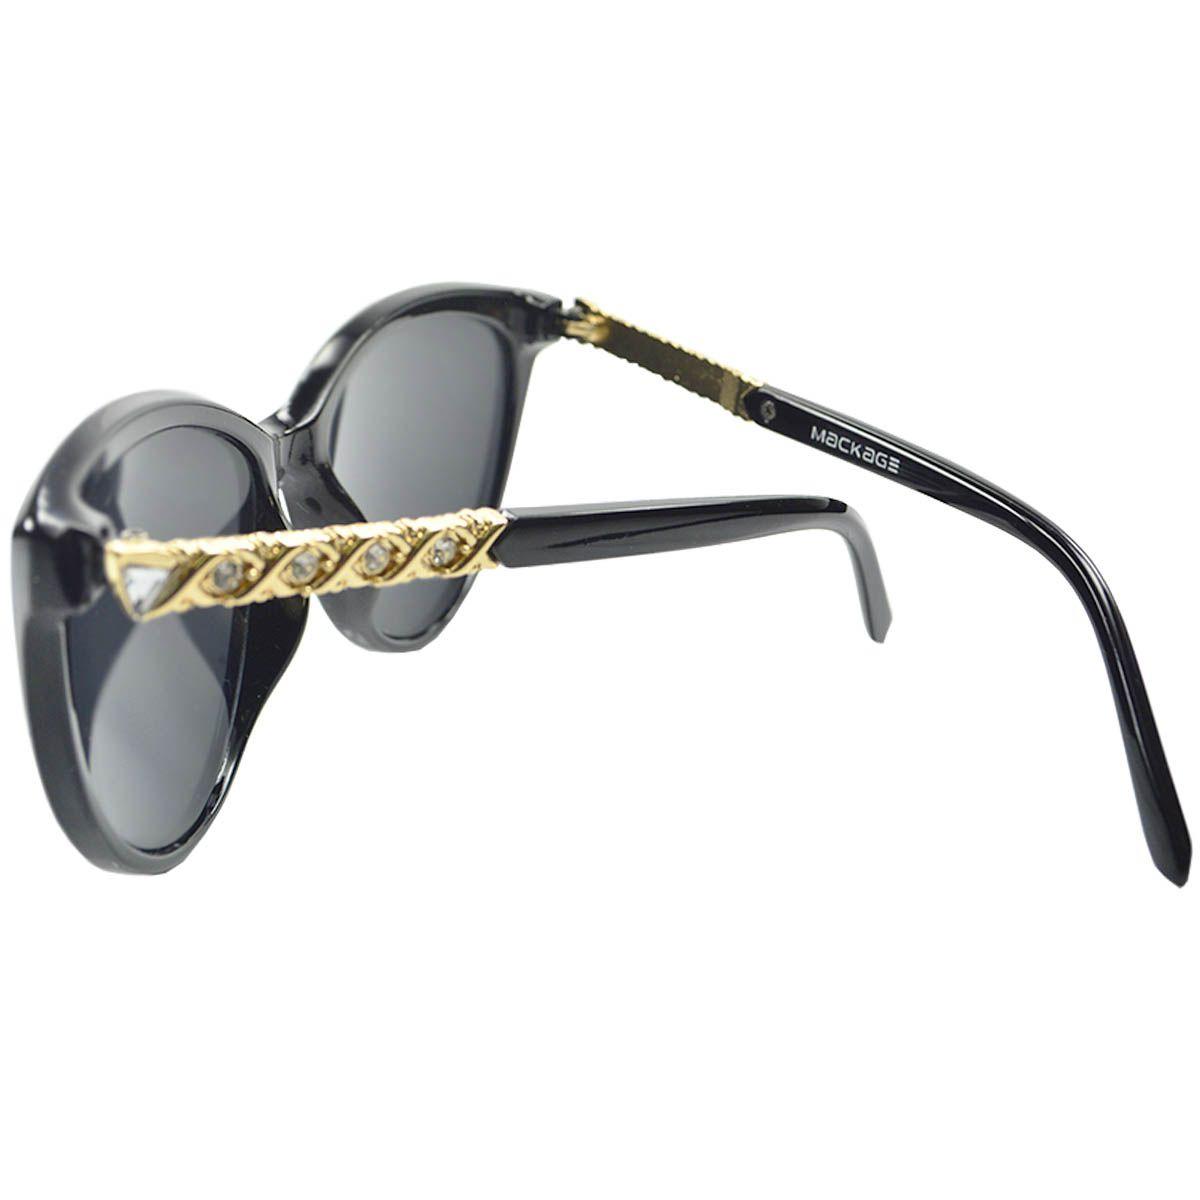 Óculos de Sol Feminino Mackage Gold Chain MK2120P